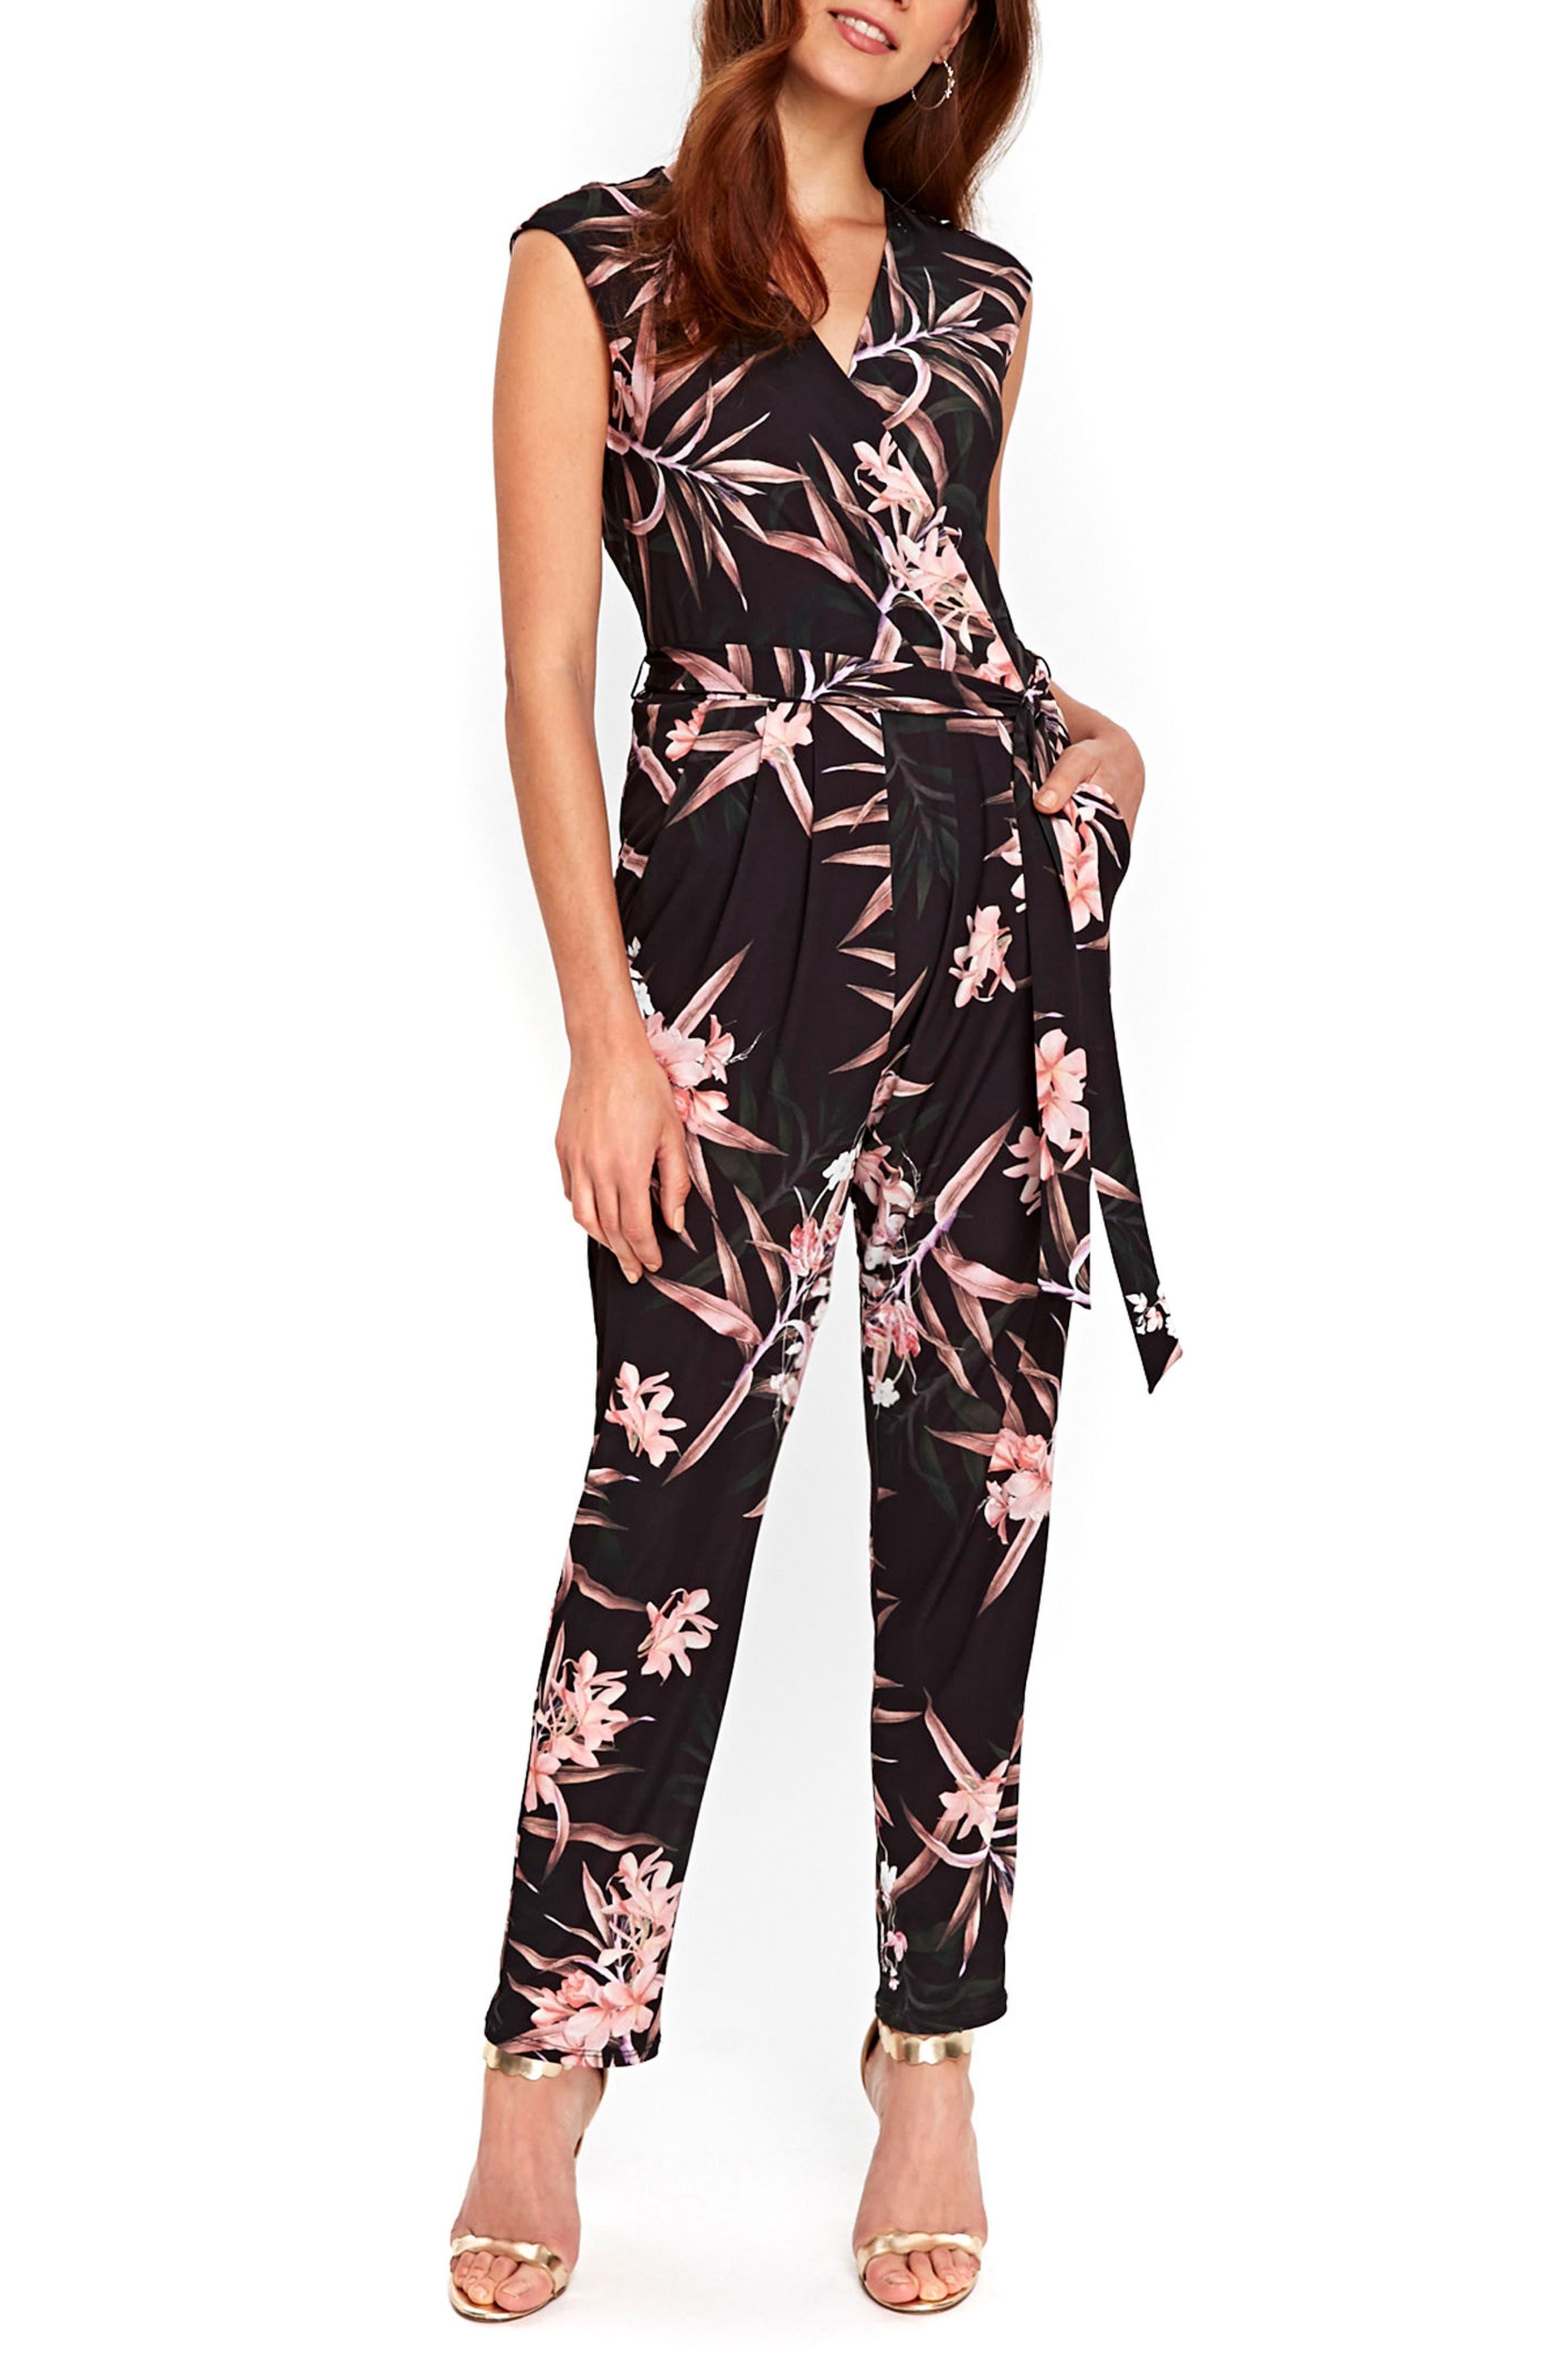 Alternate Image 1 Selected - Wallis Fern Floral Jersey Jumpsuit